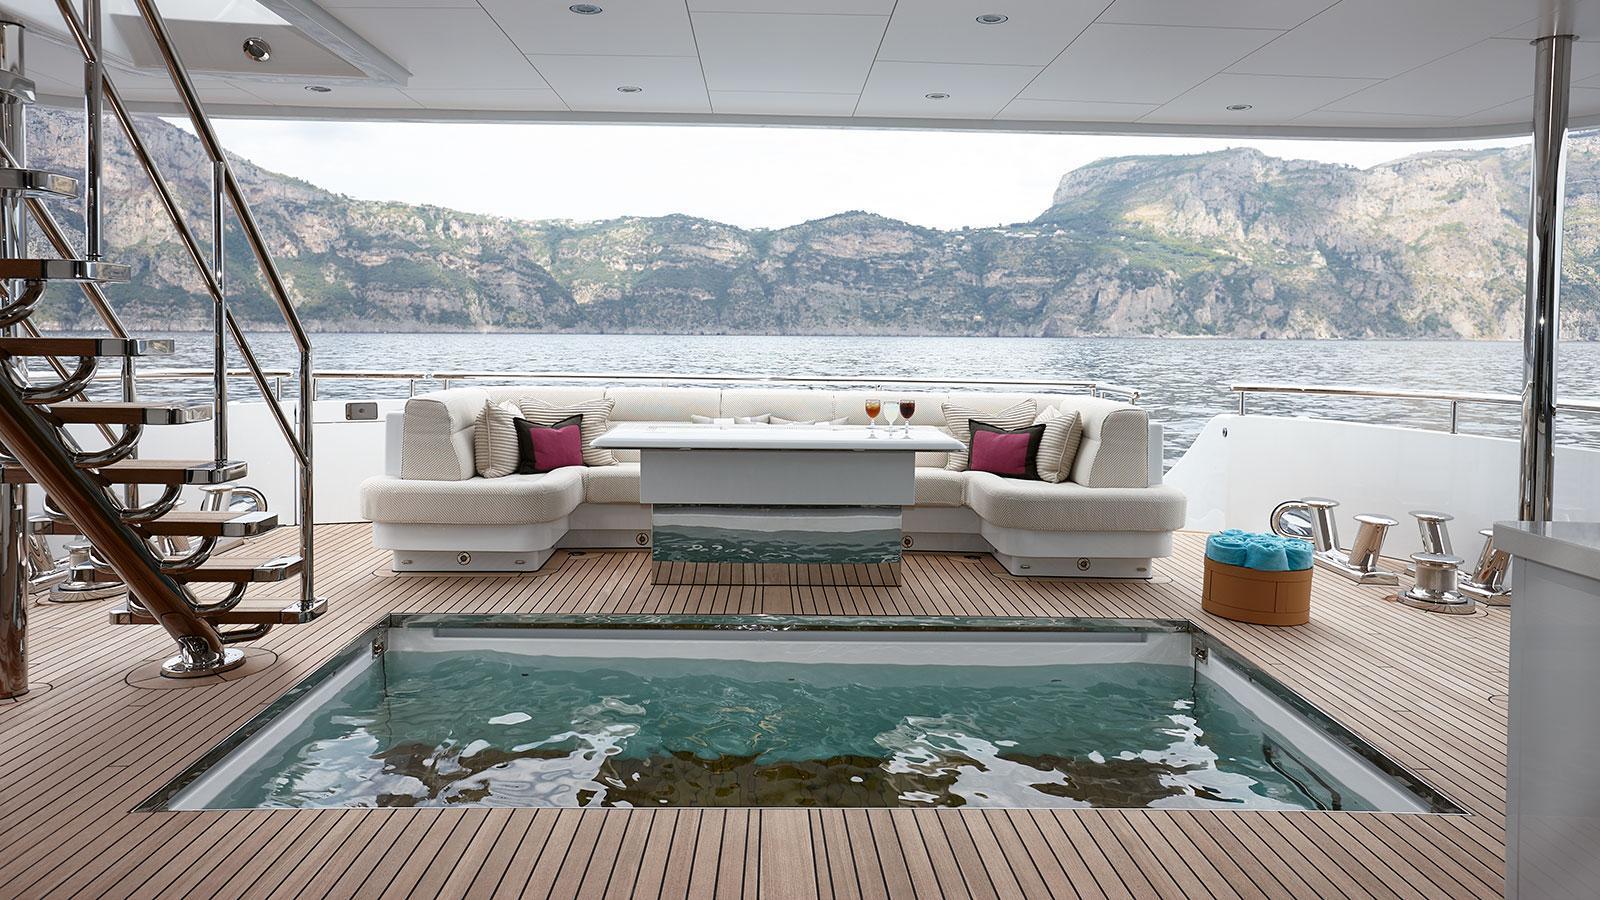 moon-sand-motor-yacht-feadship-2015-44m-aft-deck-pool